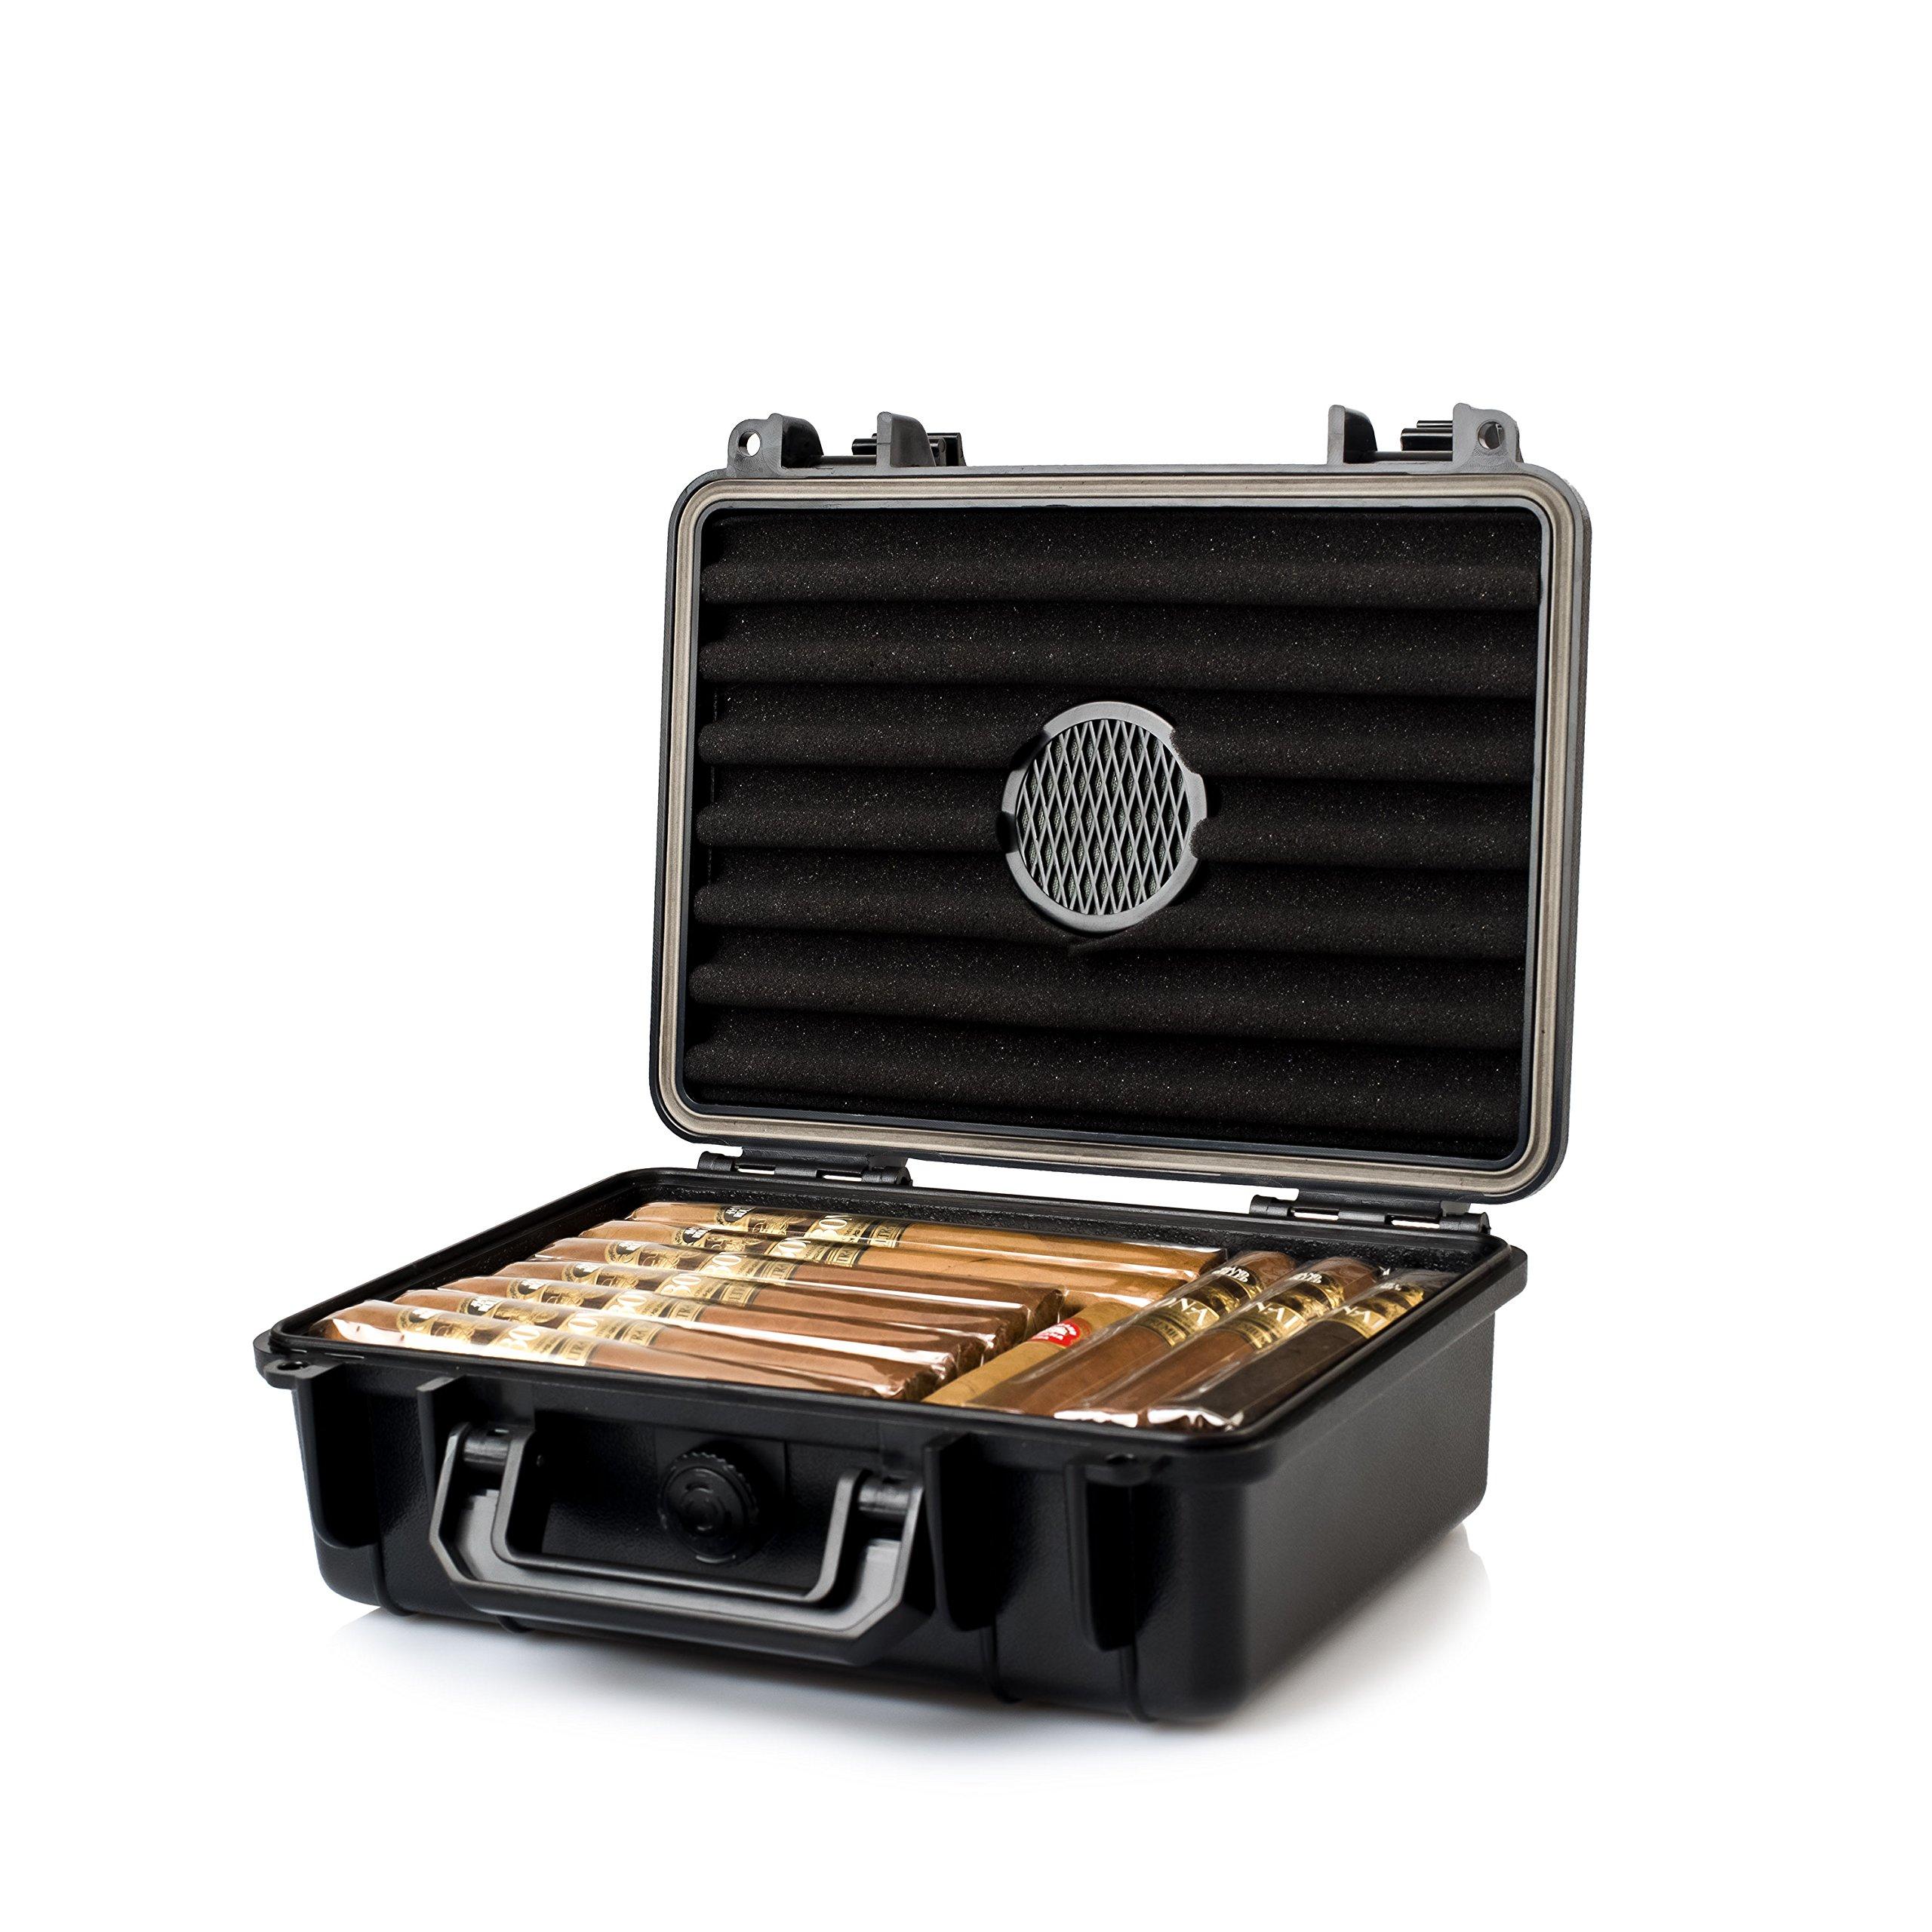 Jamestown Cigar Medium Plastic Travel Humidor Case - Waterproof, Dustproof, Shockproof Premium Plastic Hard Shell Case - Built in Foam Humidor and Holds up to 30 Full-Sized Cigars